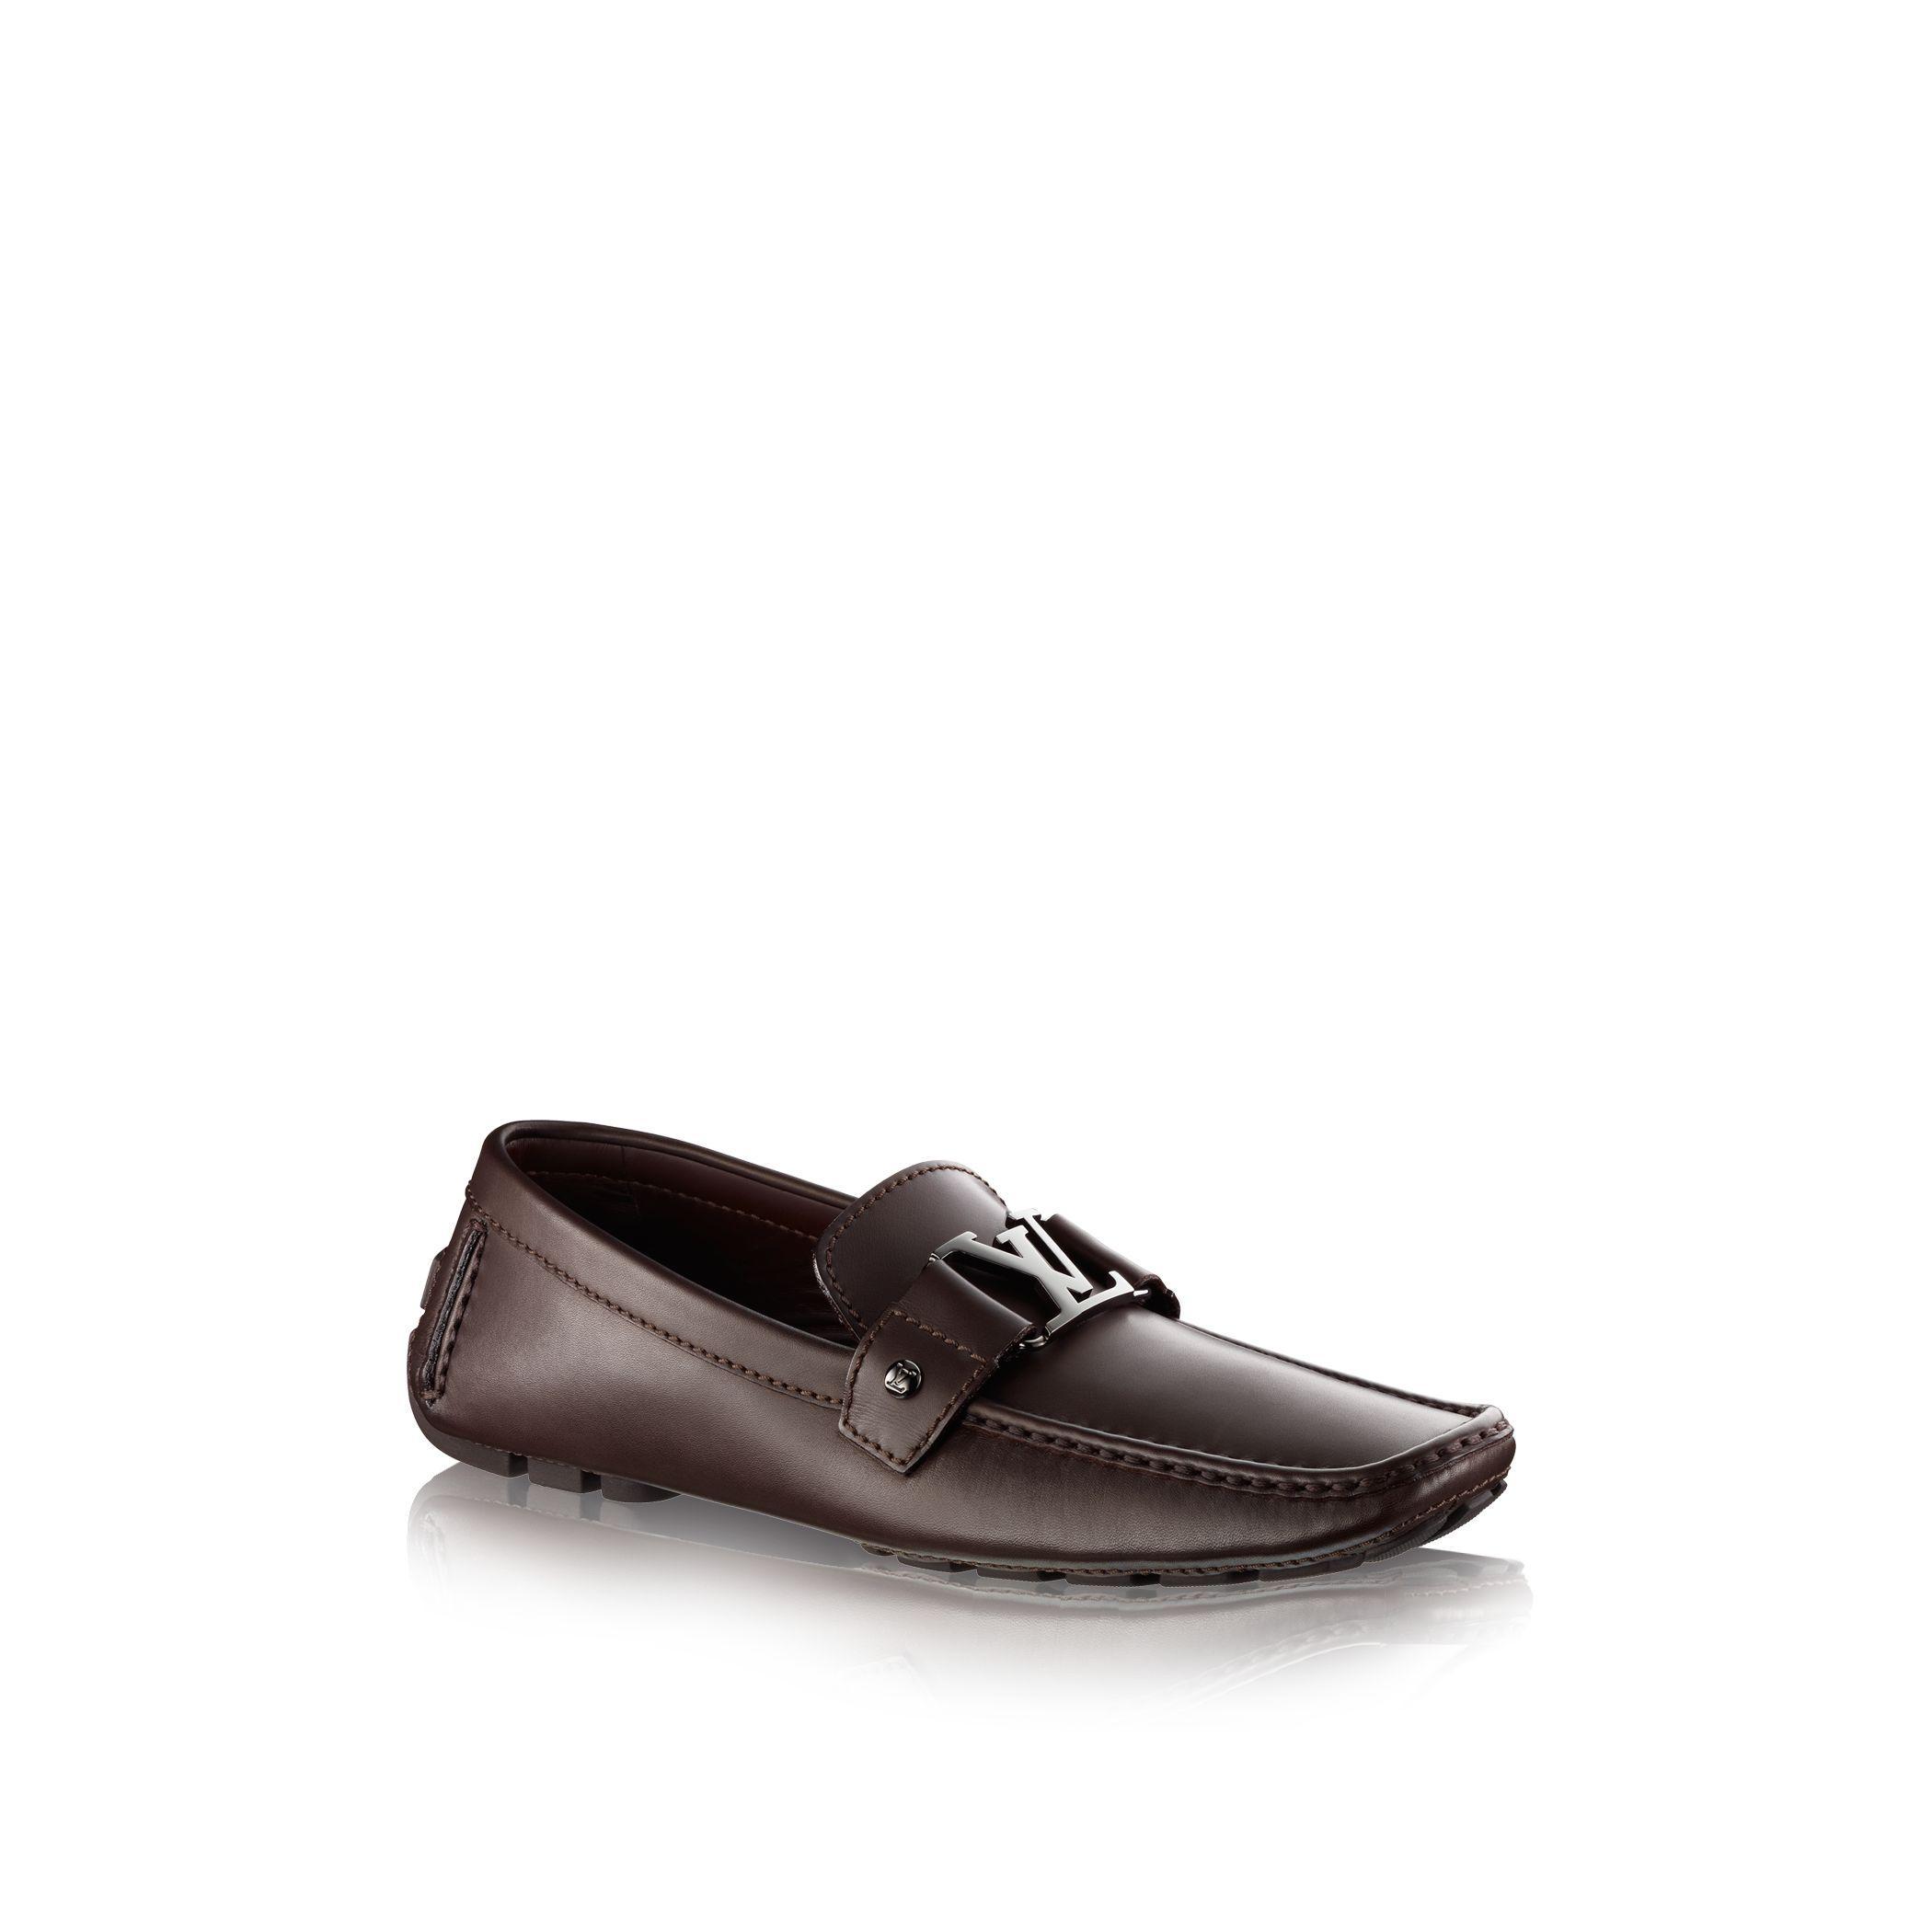 louis vuitton monte carlo car shoe in purple for men lyst. Black Bedroom Furniture Sets. Home Design Ideas